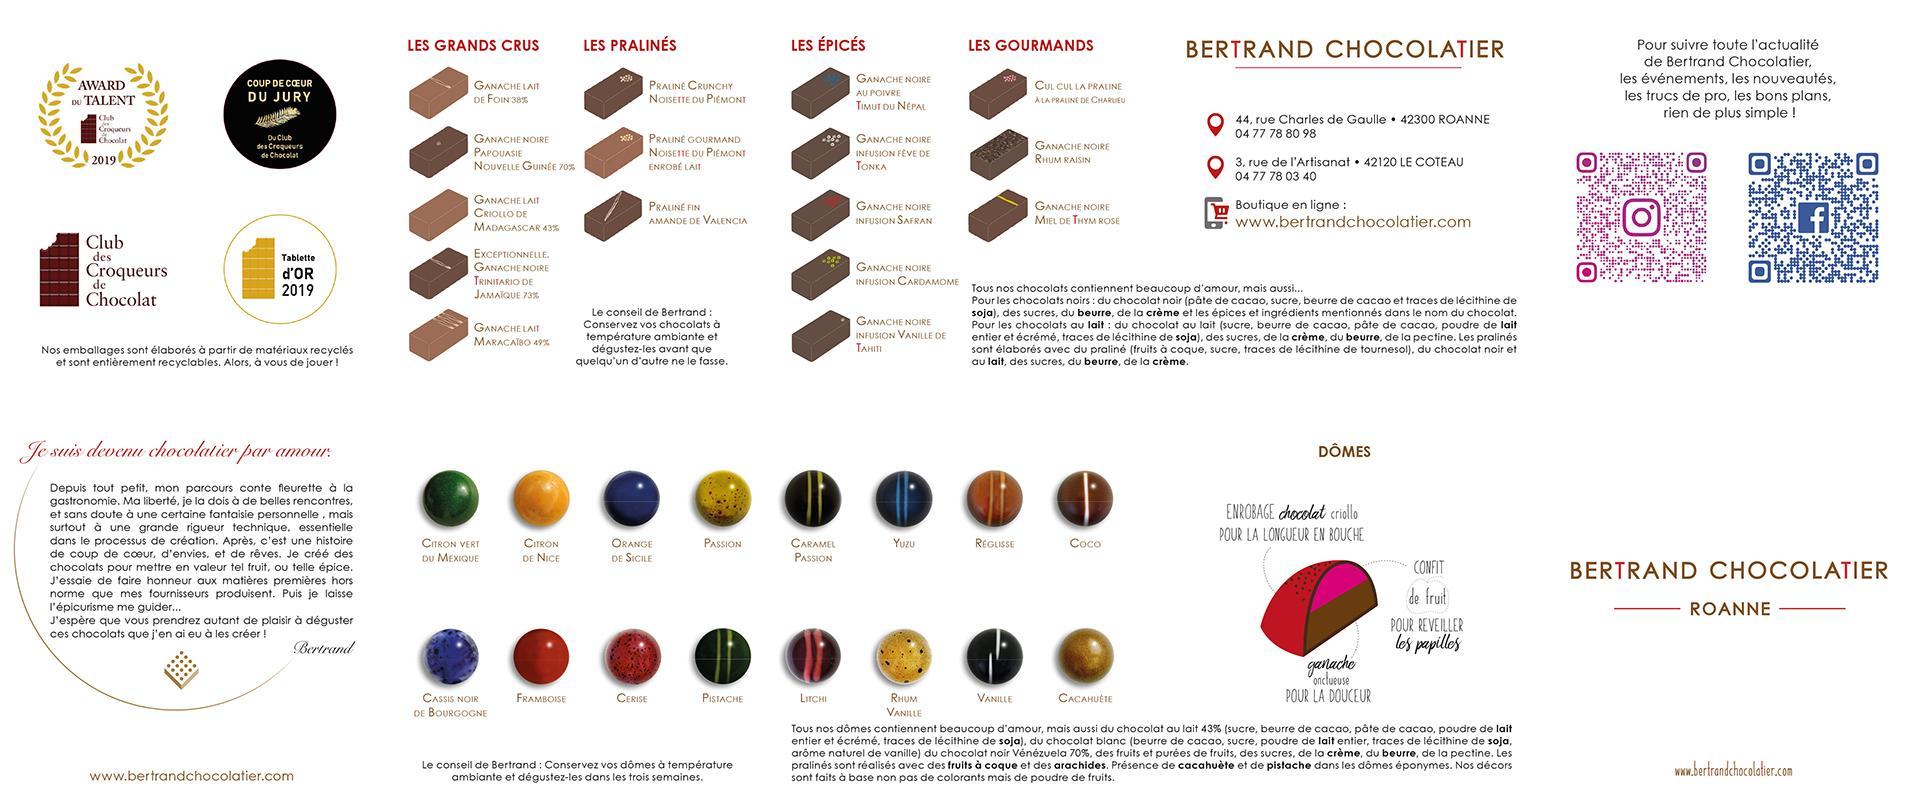 Nos dômes et chocolats   Bertrand Chocolatier